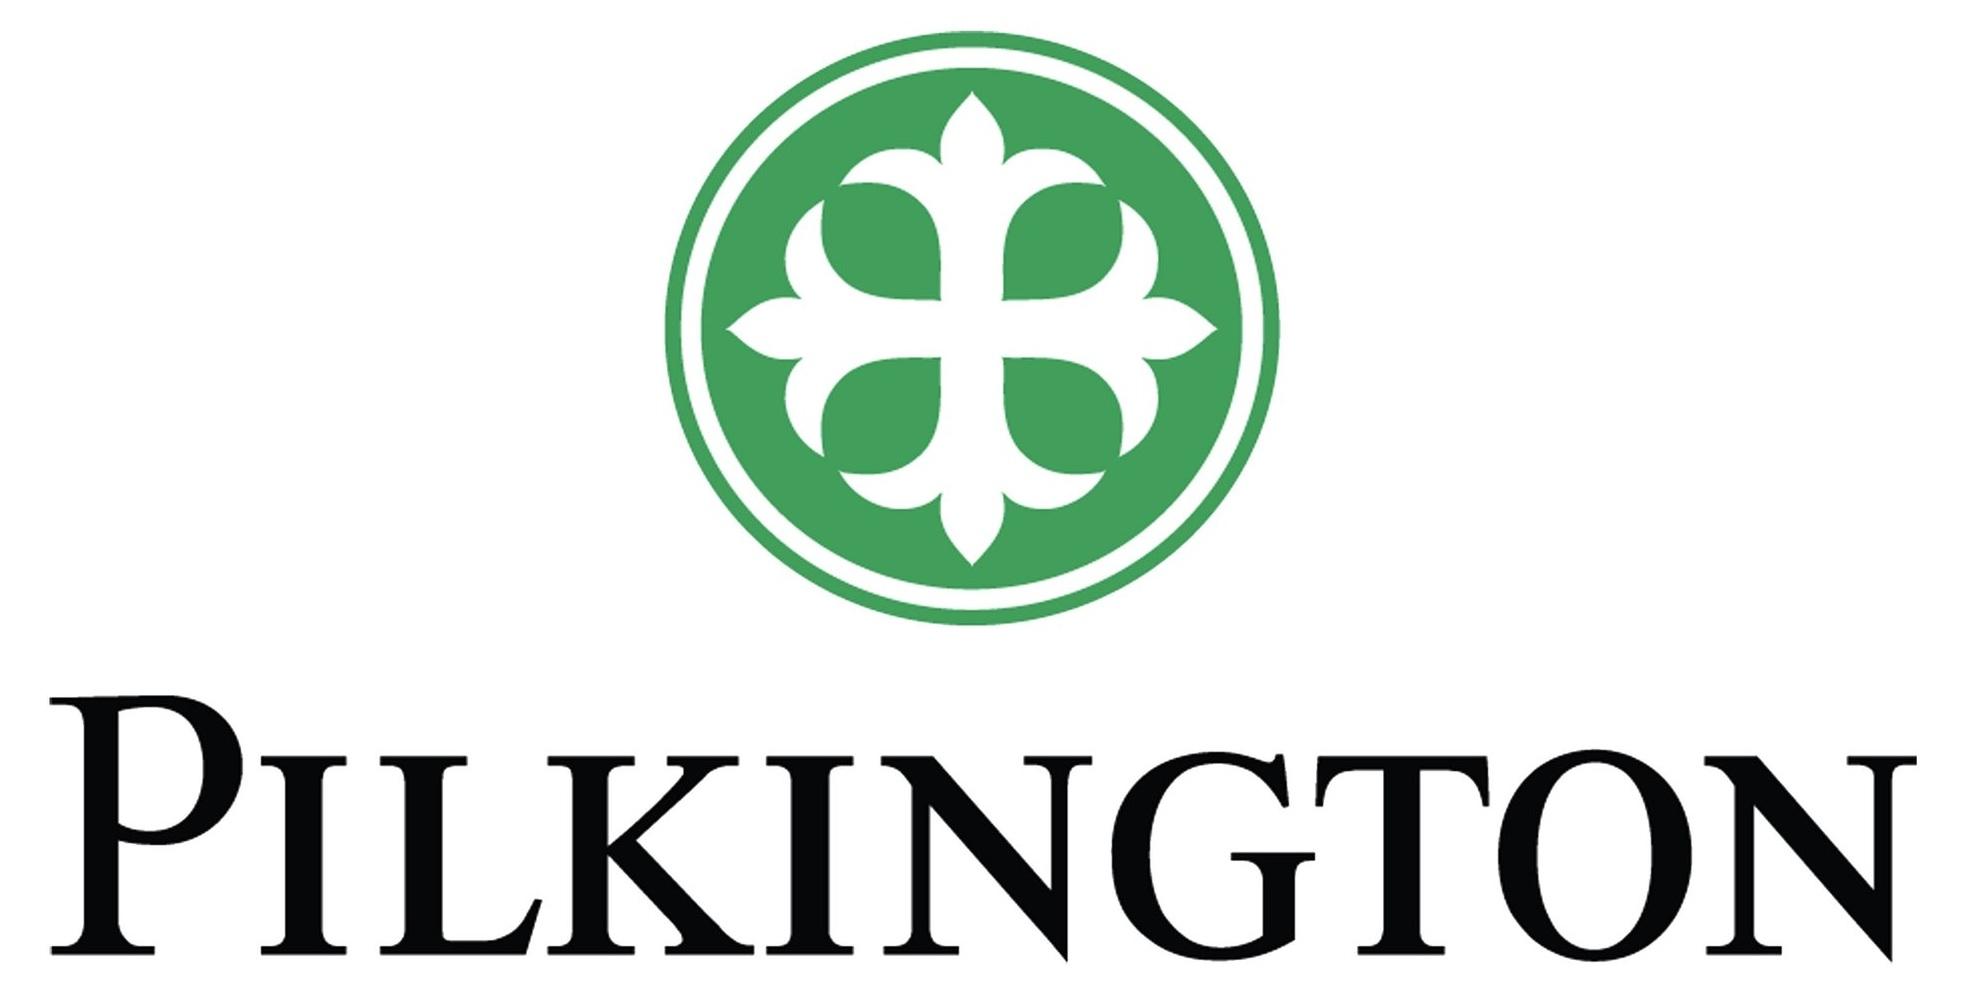 Pilkington logo.jpg